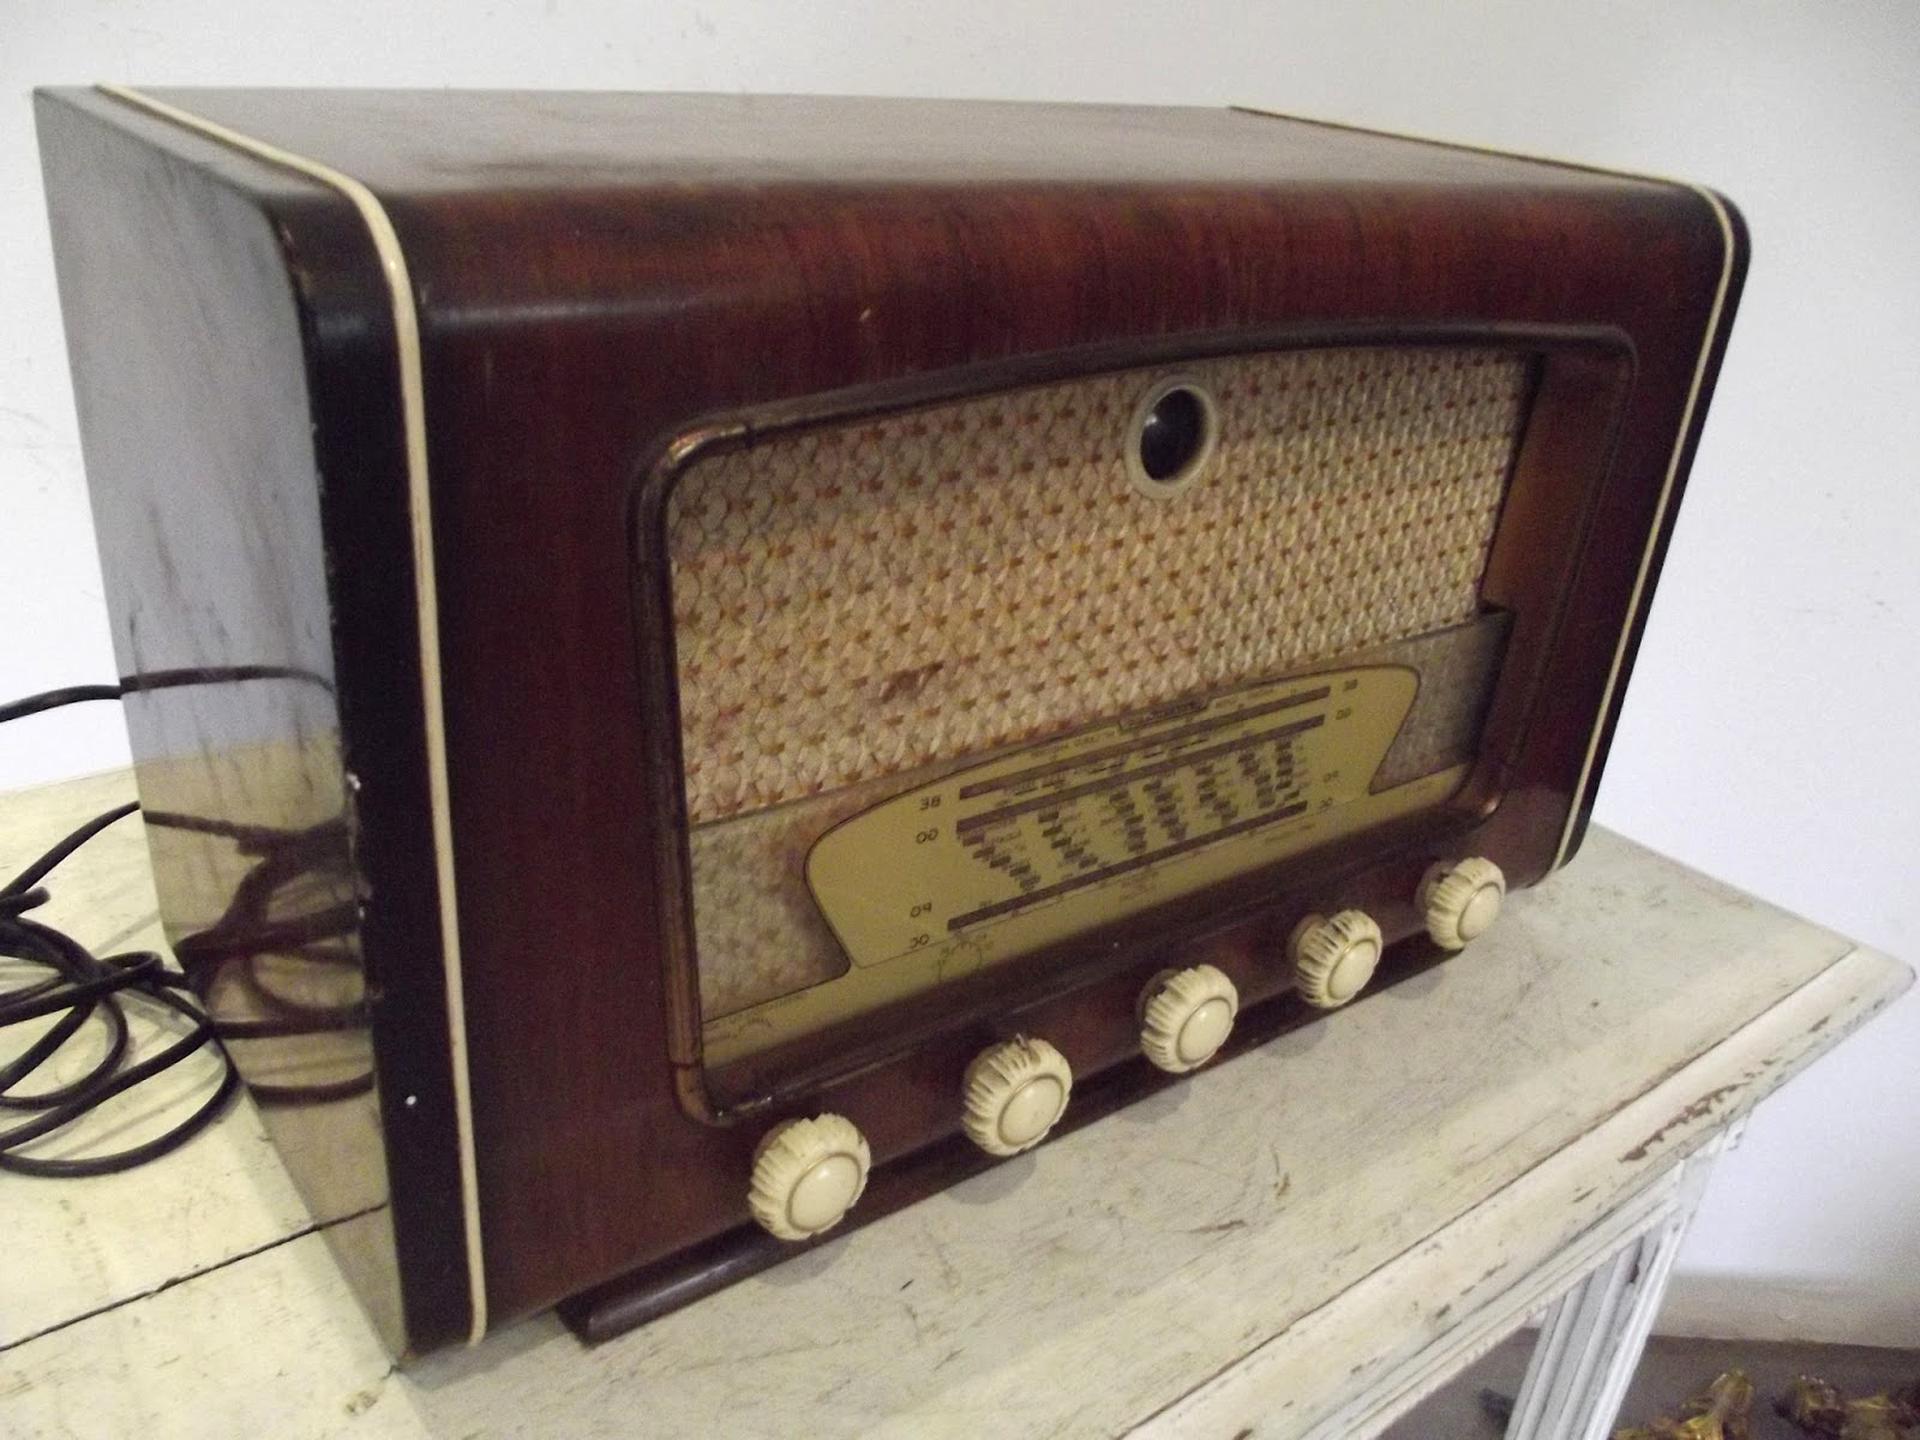 radio tsf general radio d'occasion